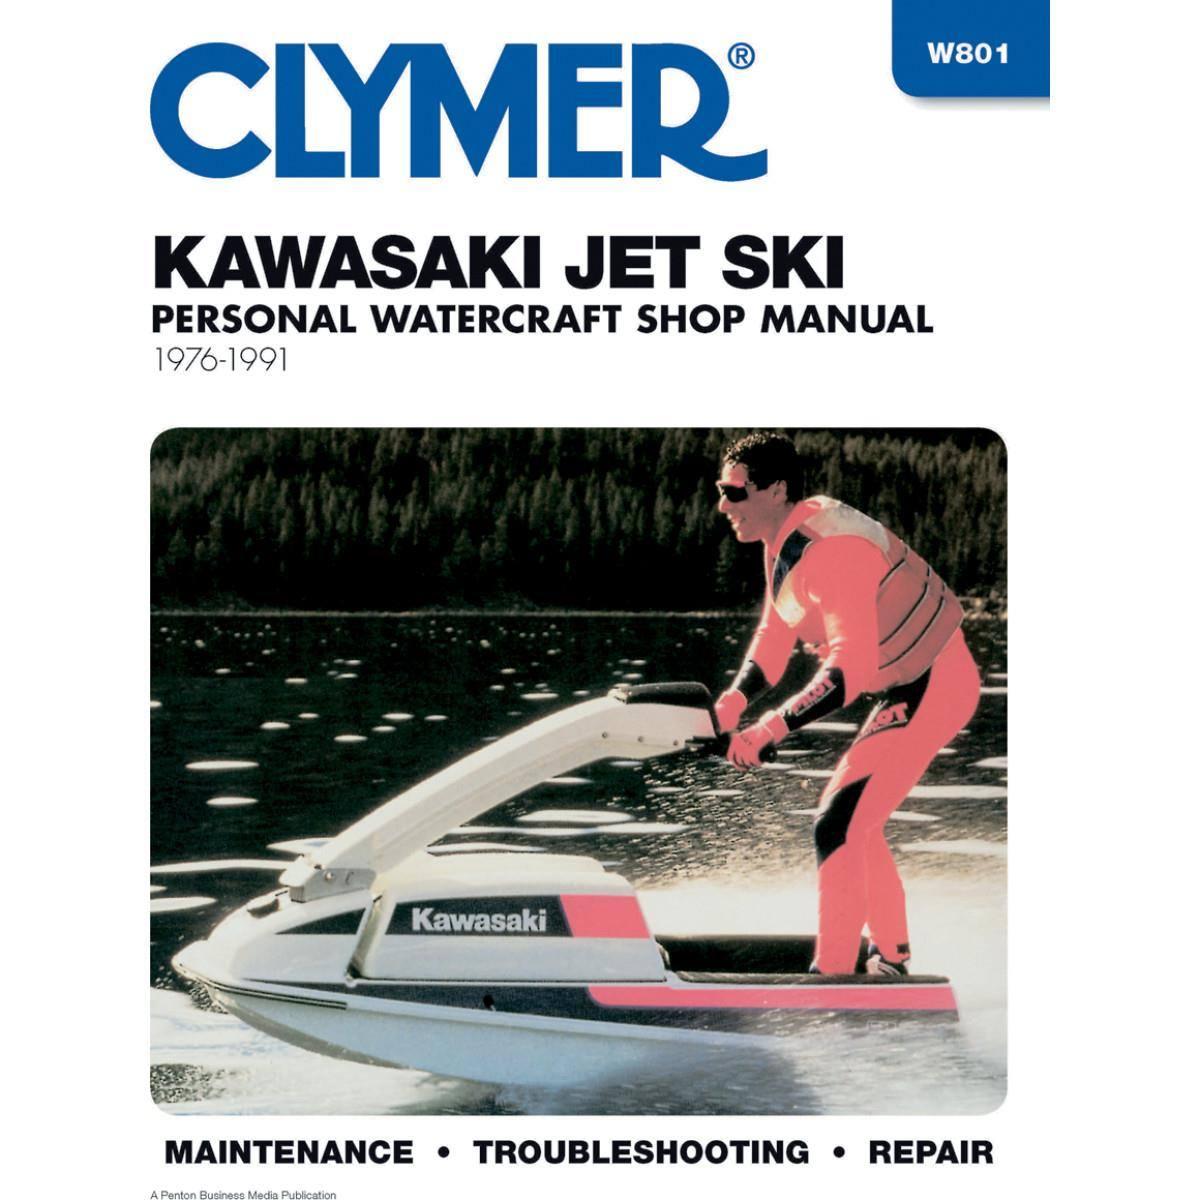 Repair Manuals for sale in Indianapolis, IN   Dreyer Motorsports (877)  413-8881